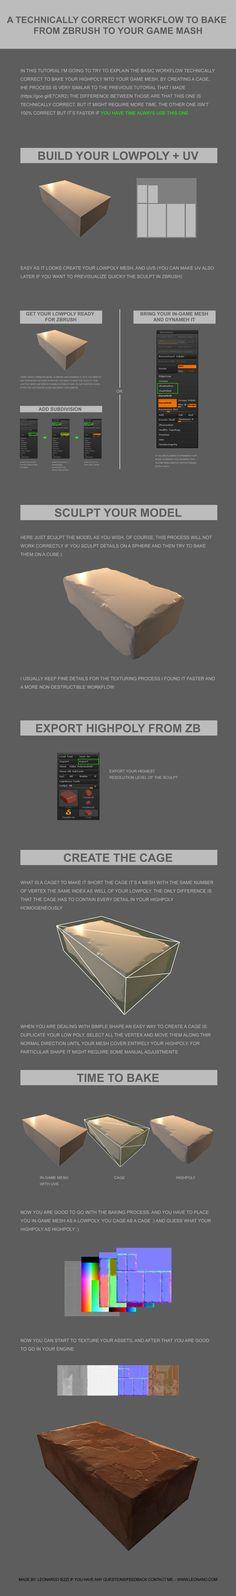 ArtStation - #5 A workflow to bake details from ZBrush to lowpoly + alternative, Leonardo Iezzi